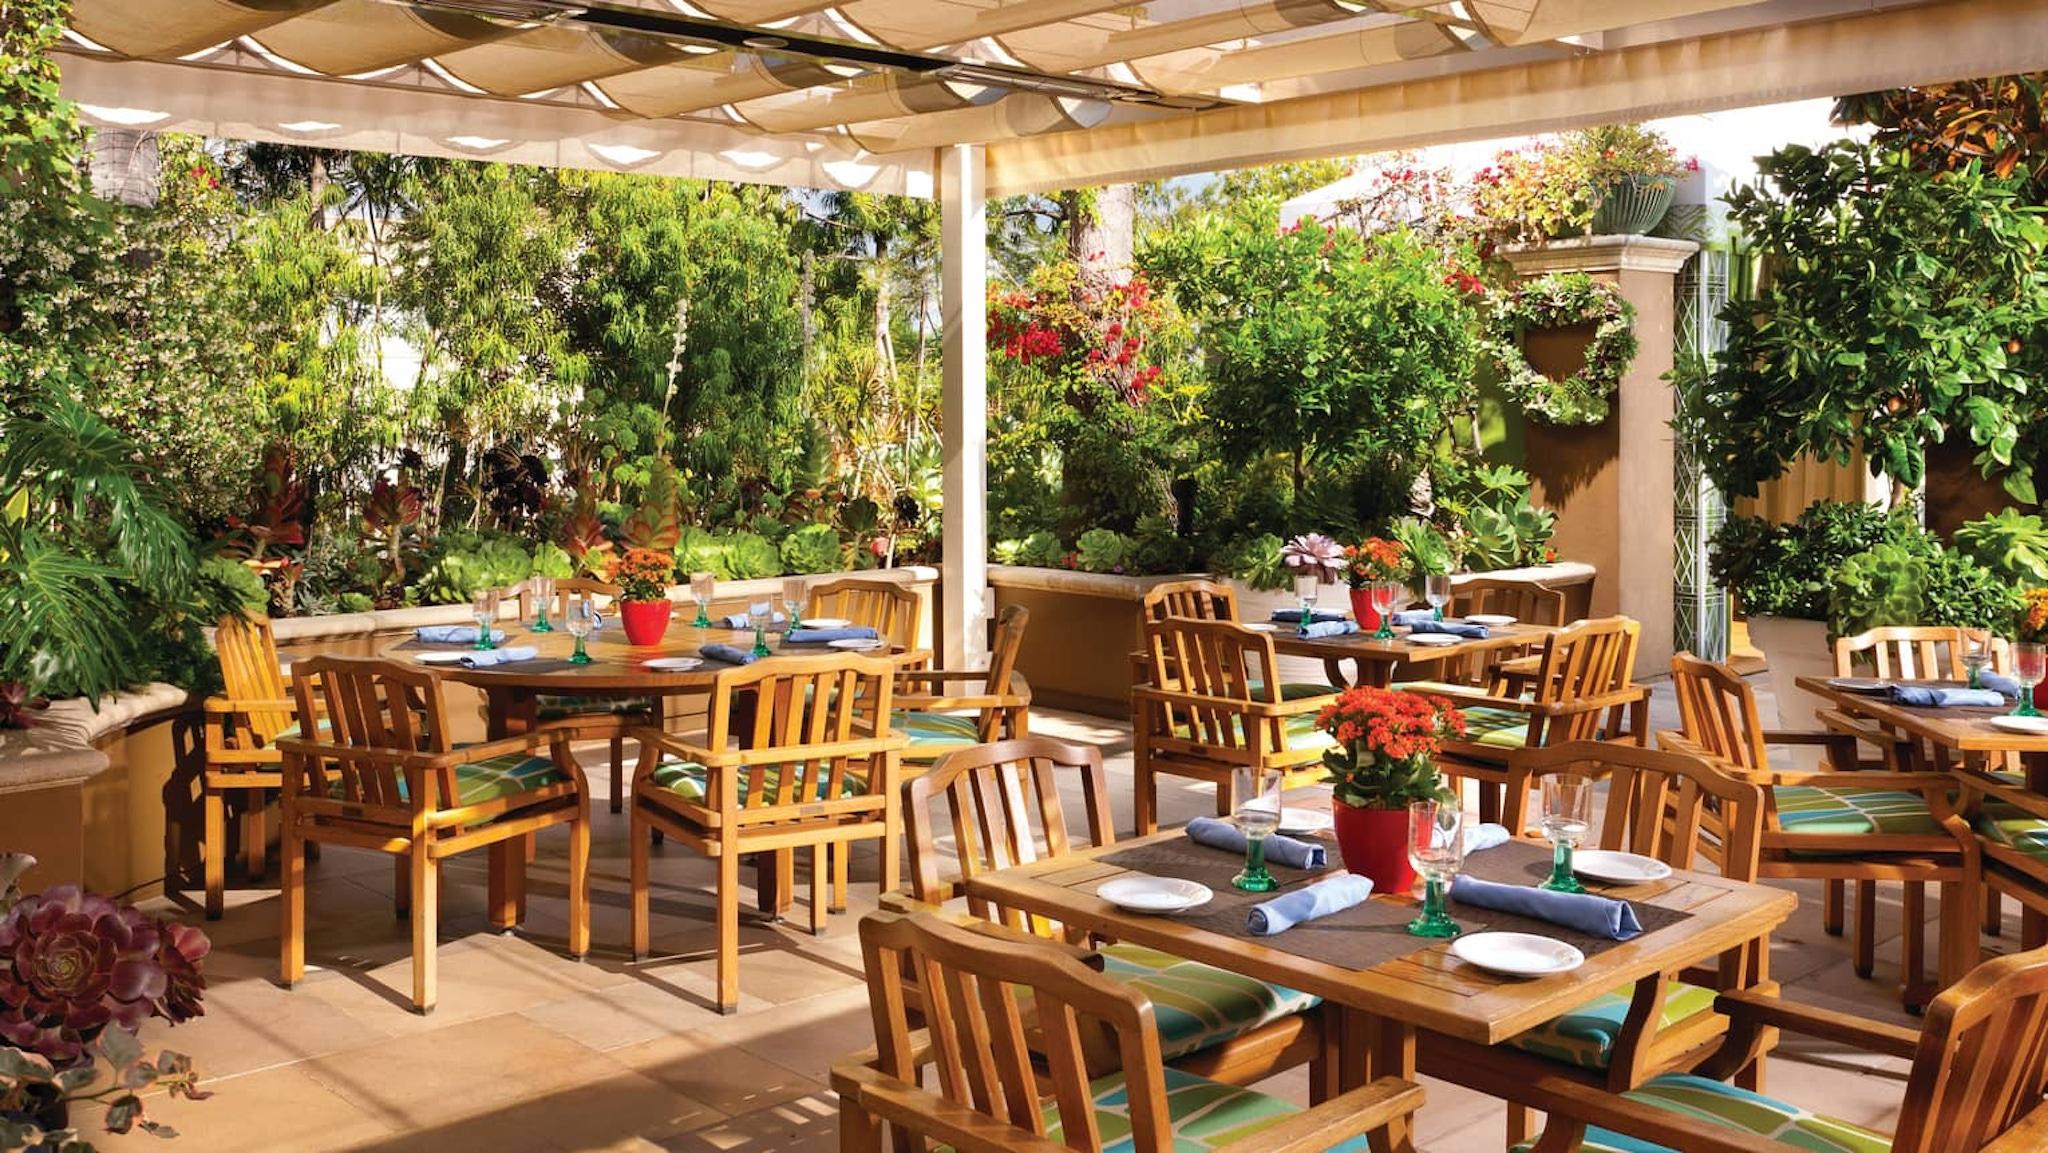 Cabana, Four Seasons Los Angeles at Beverly Hills